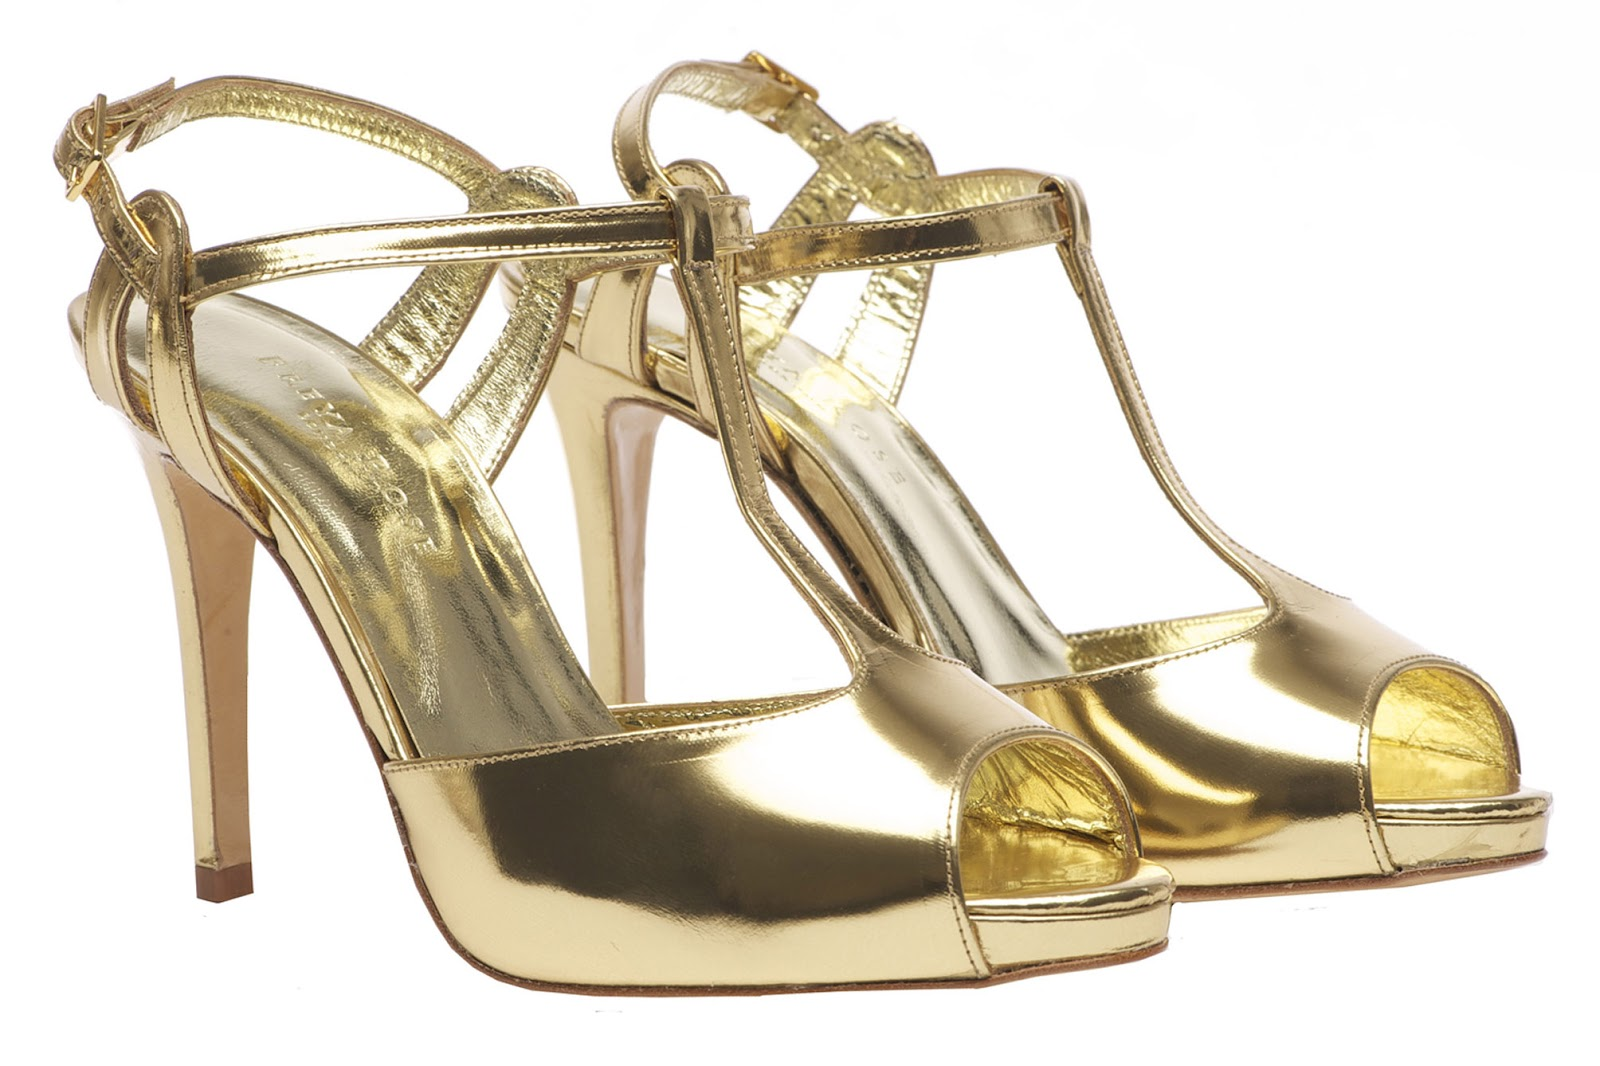 I heart wedding dress gold wedding shoes for Gold dress shoes for wedding